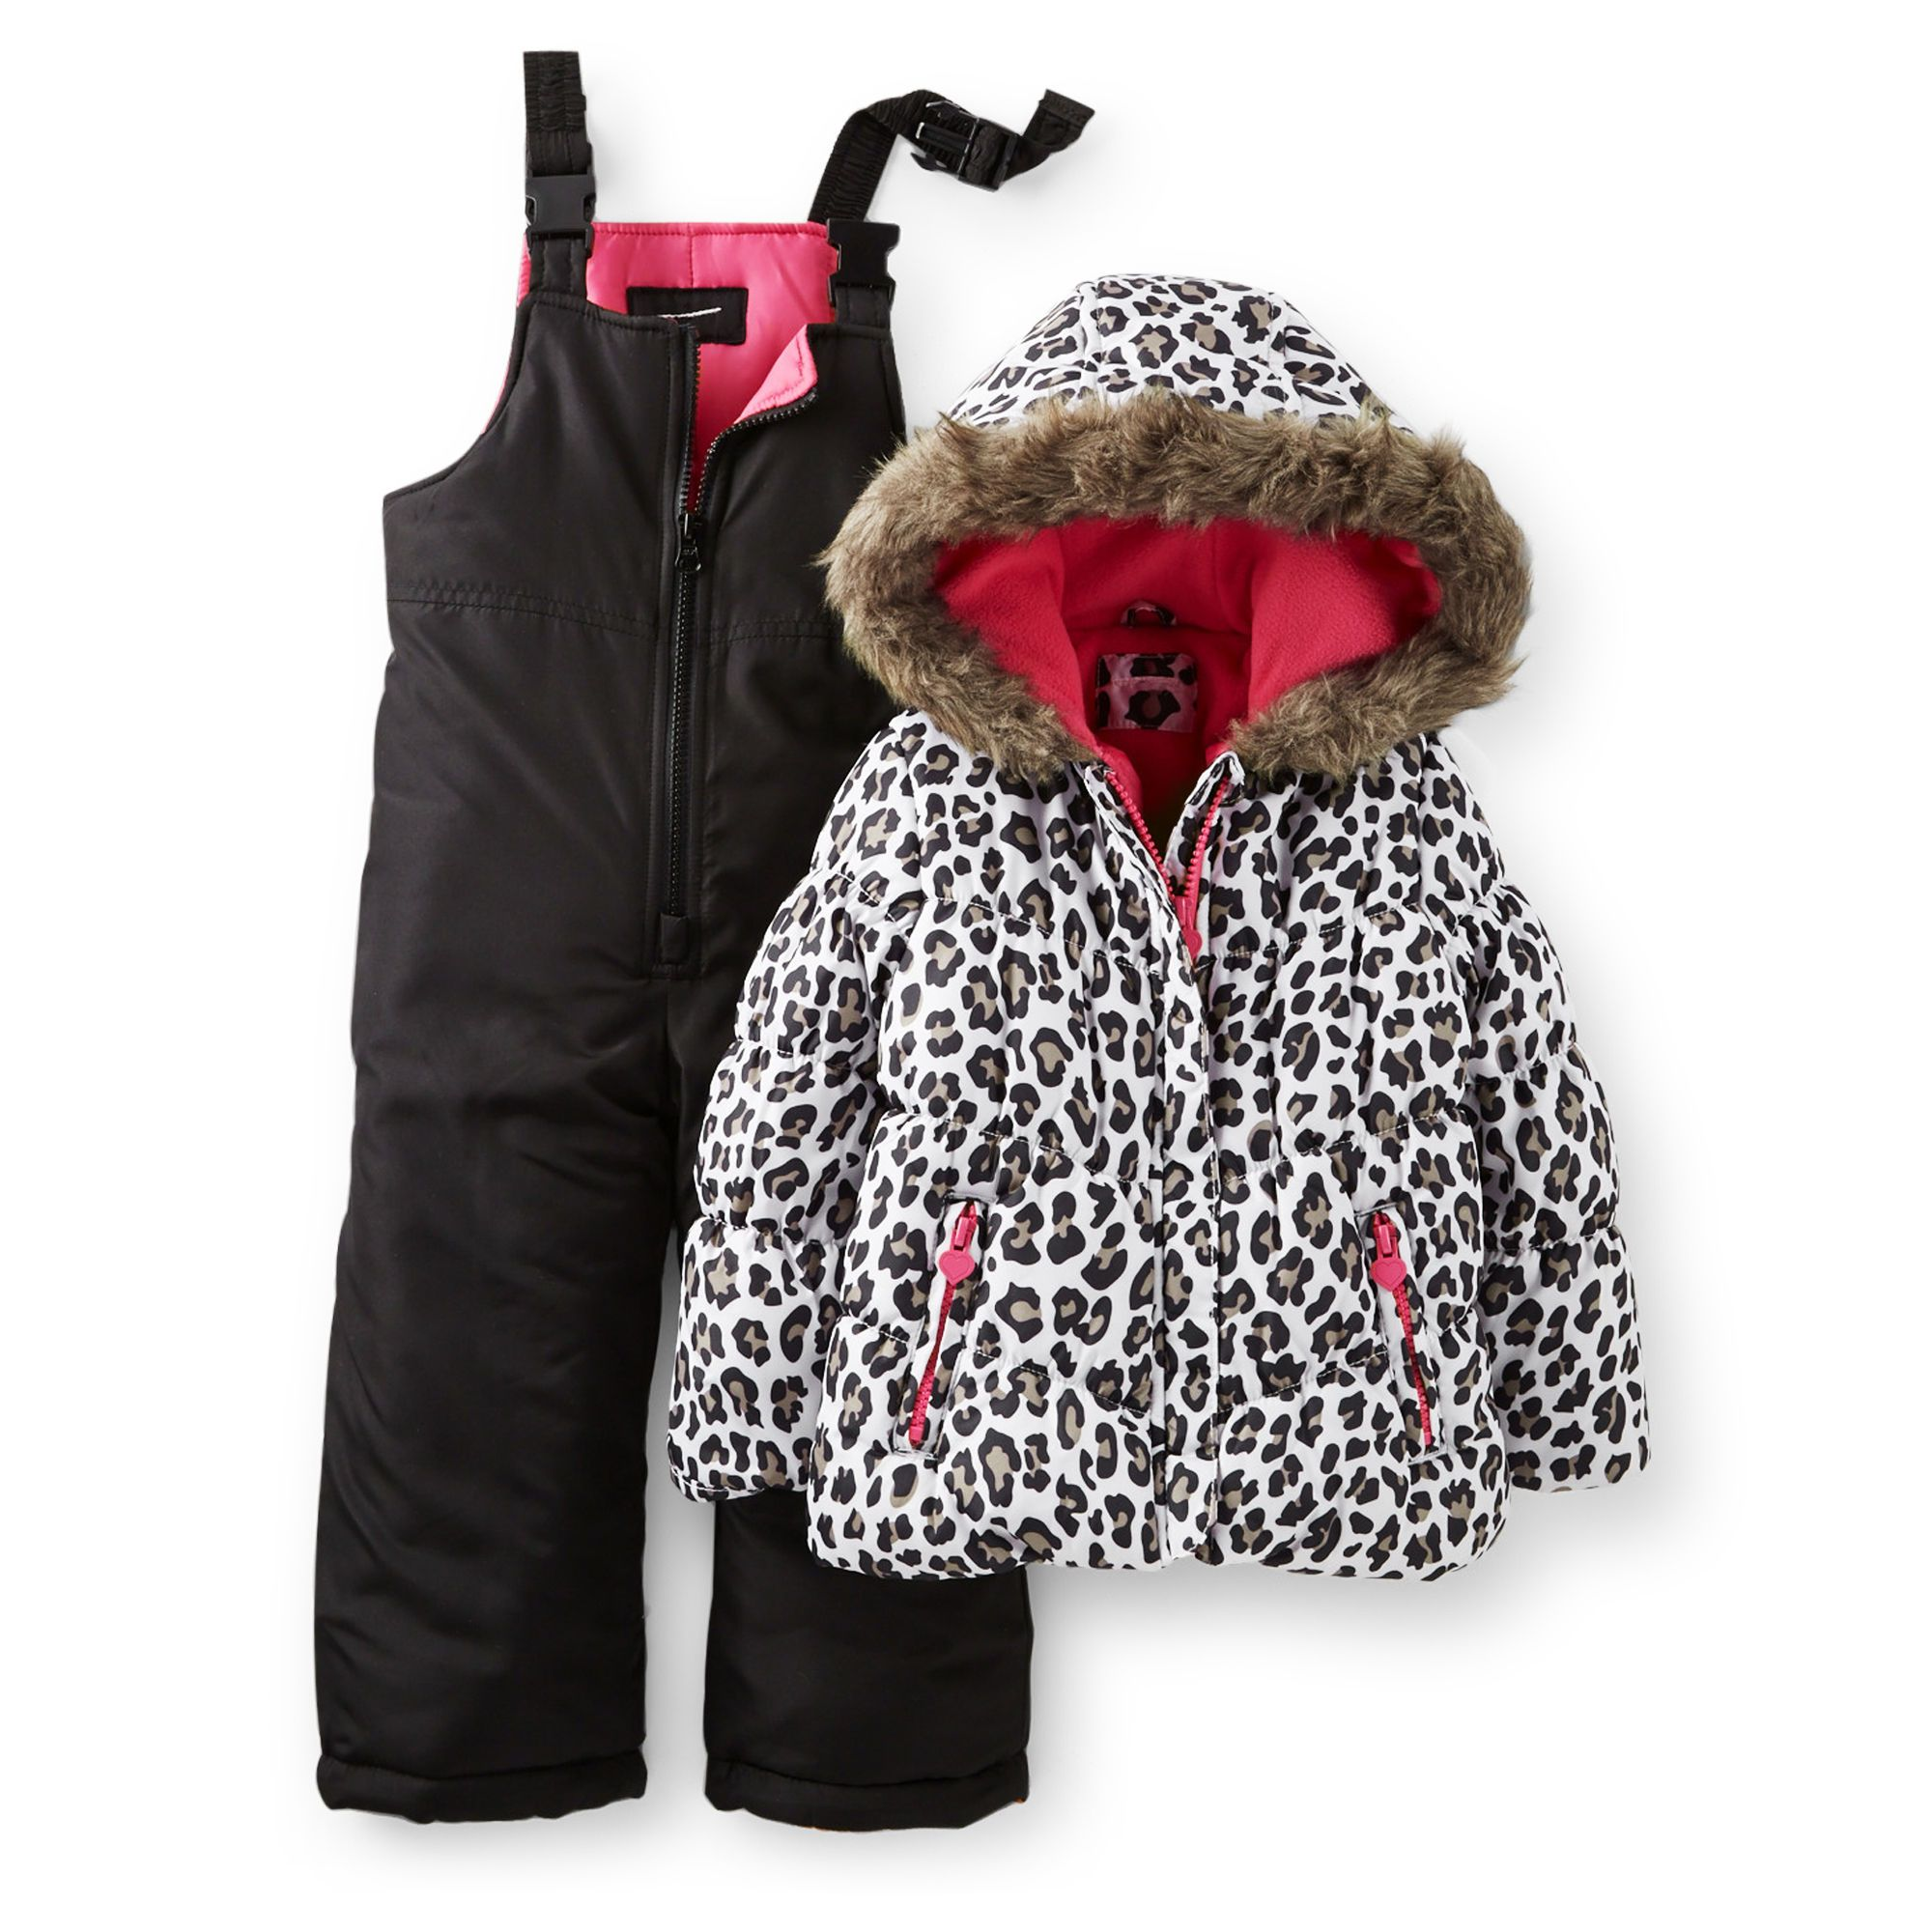 615c30ee9 2-Piece Leopard Print Snowsuit